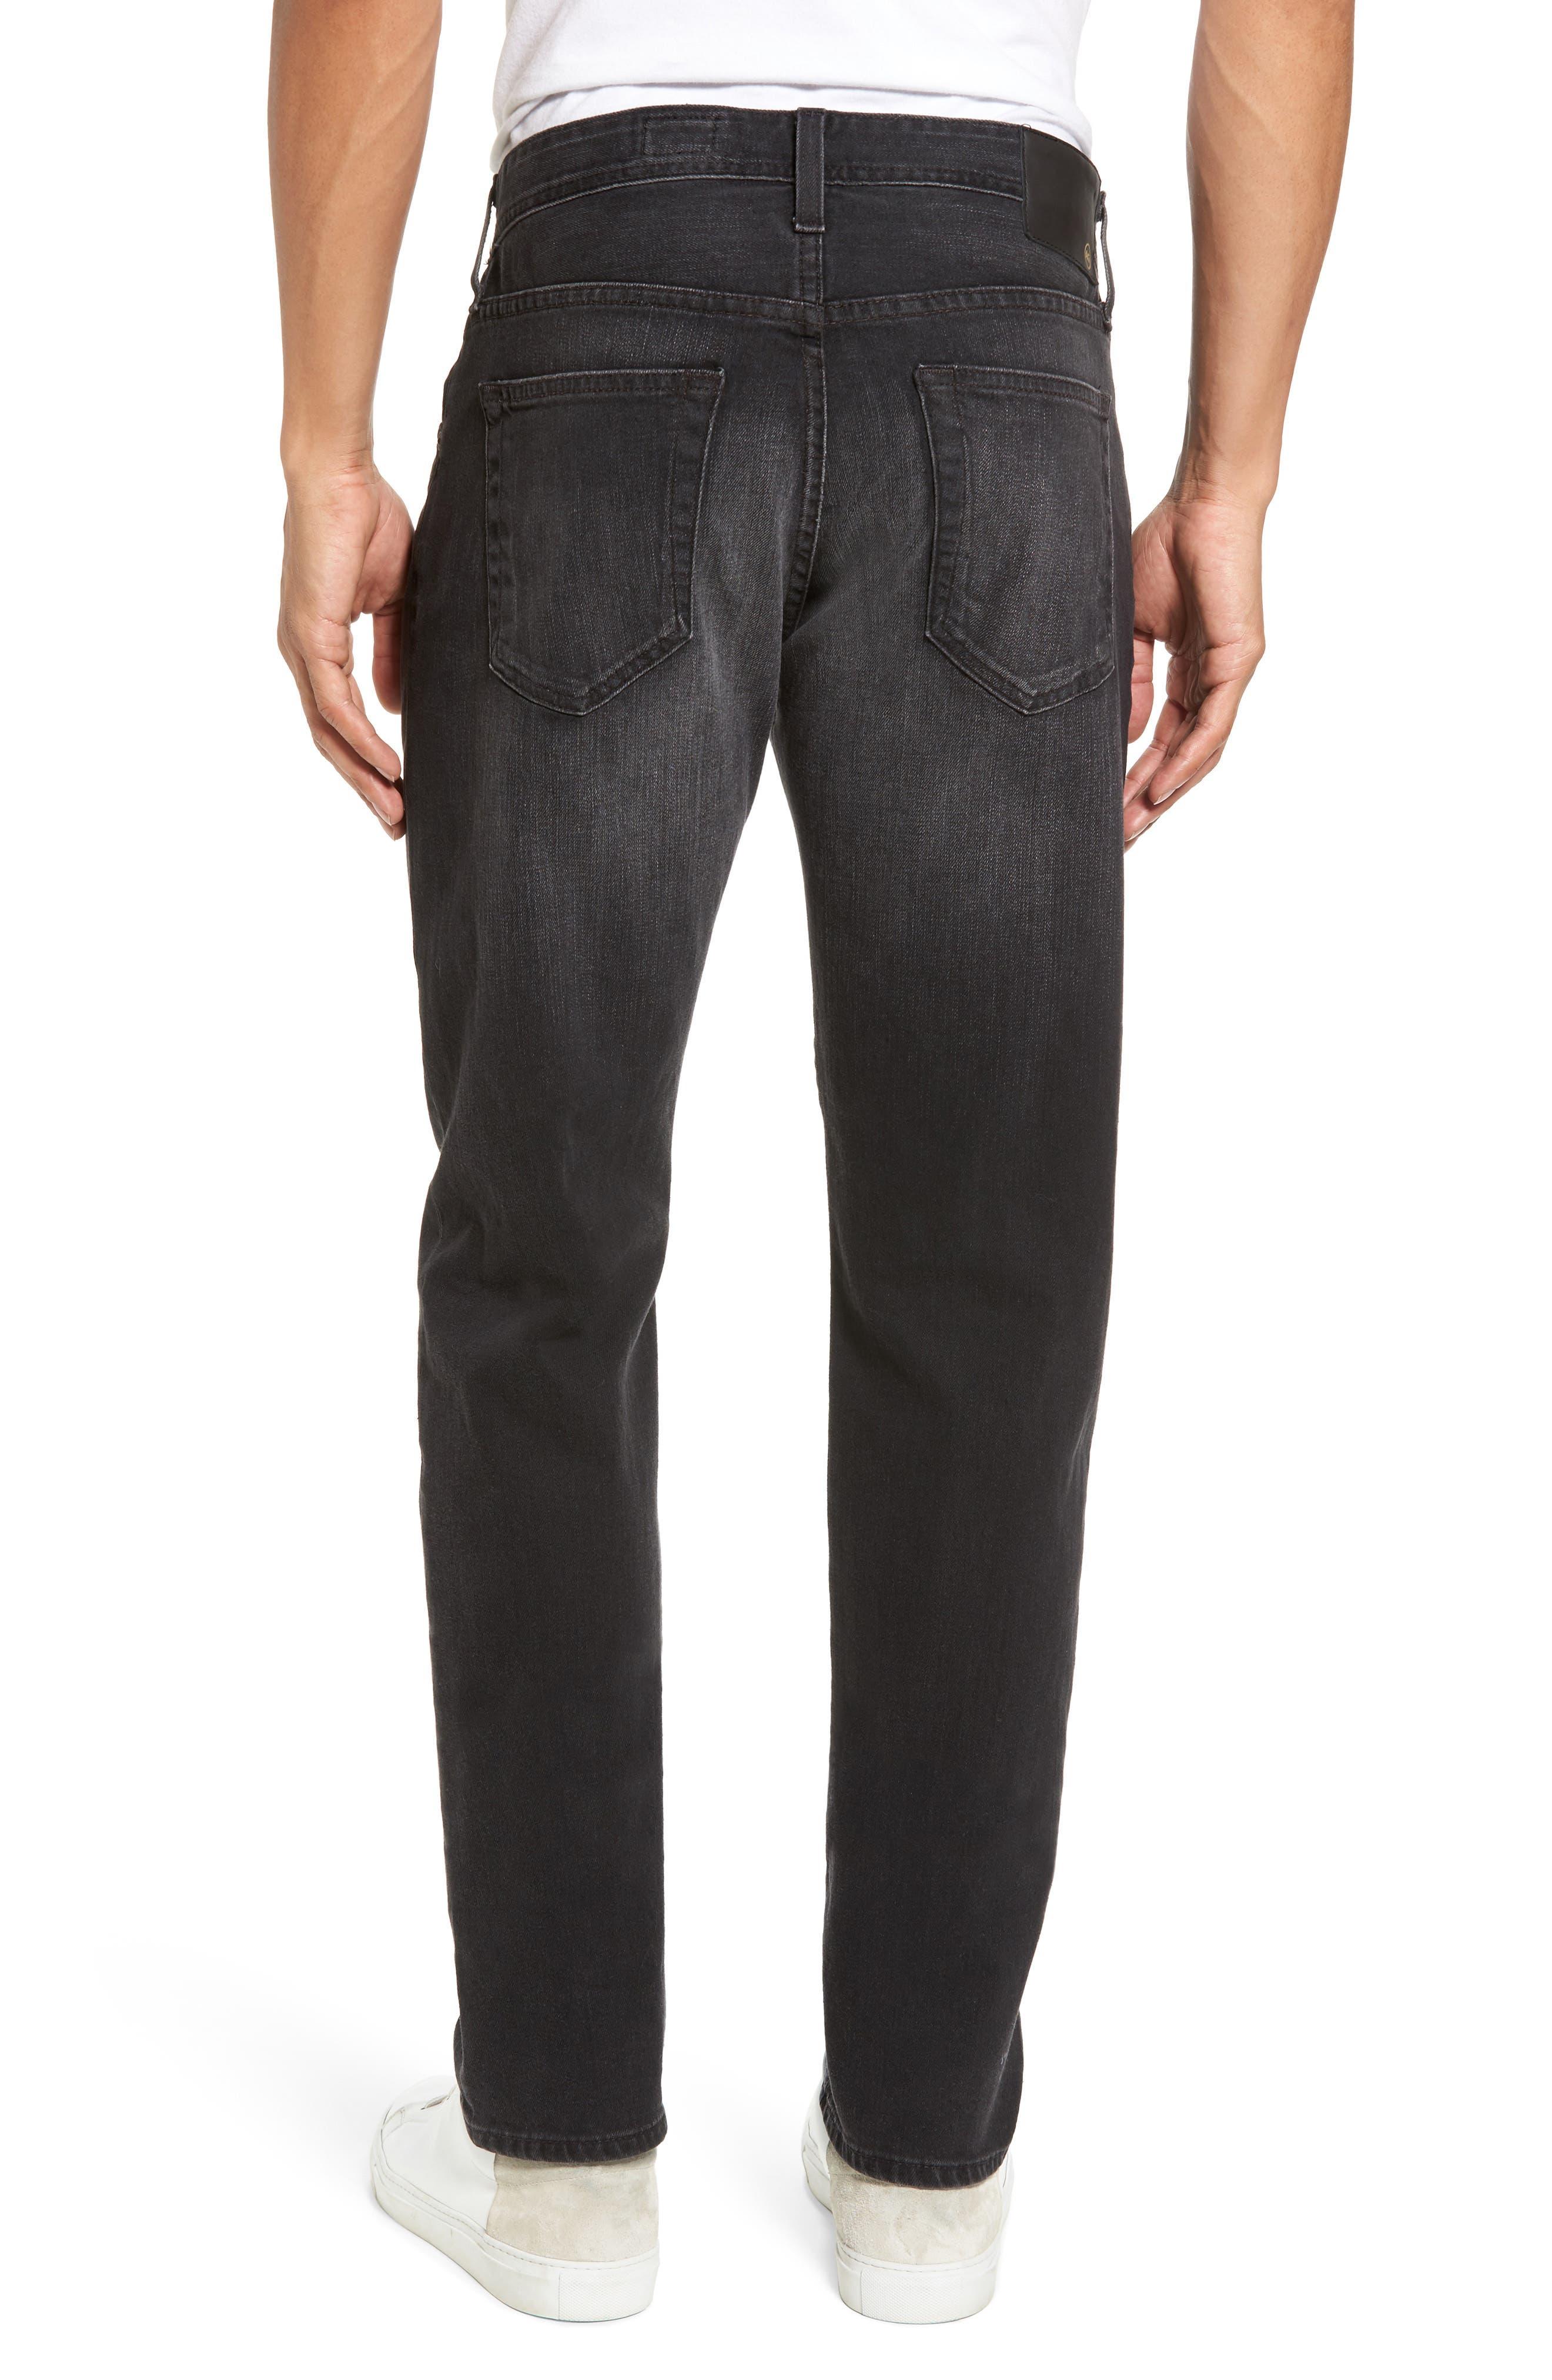 Tellis Modern Slim Fit Jeans,                             Alternate thumbnail 2, color,                             Smudged Black